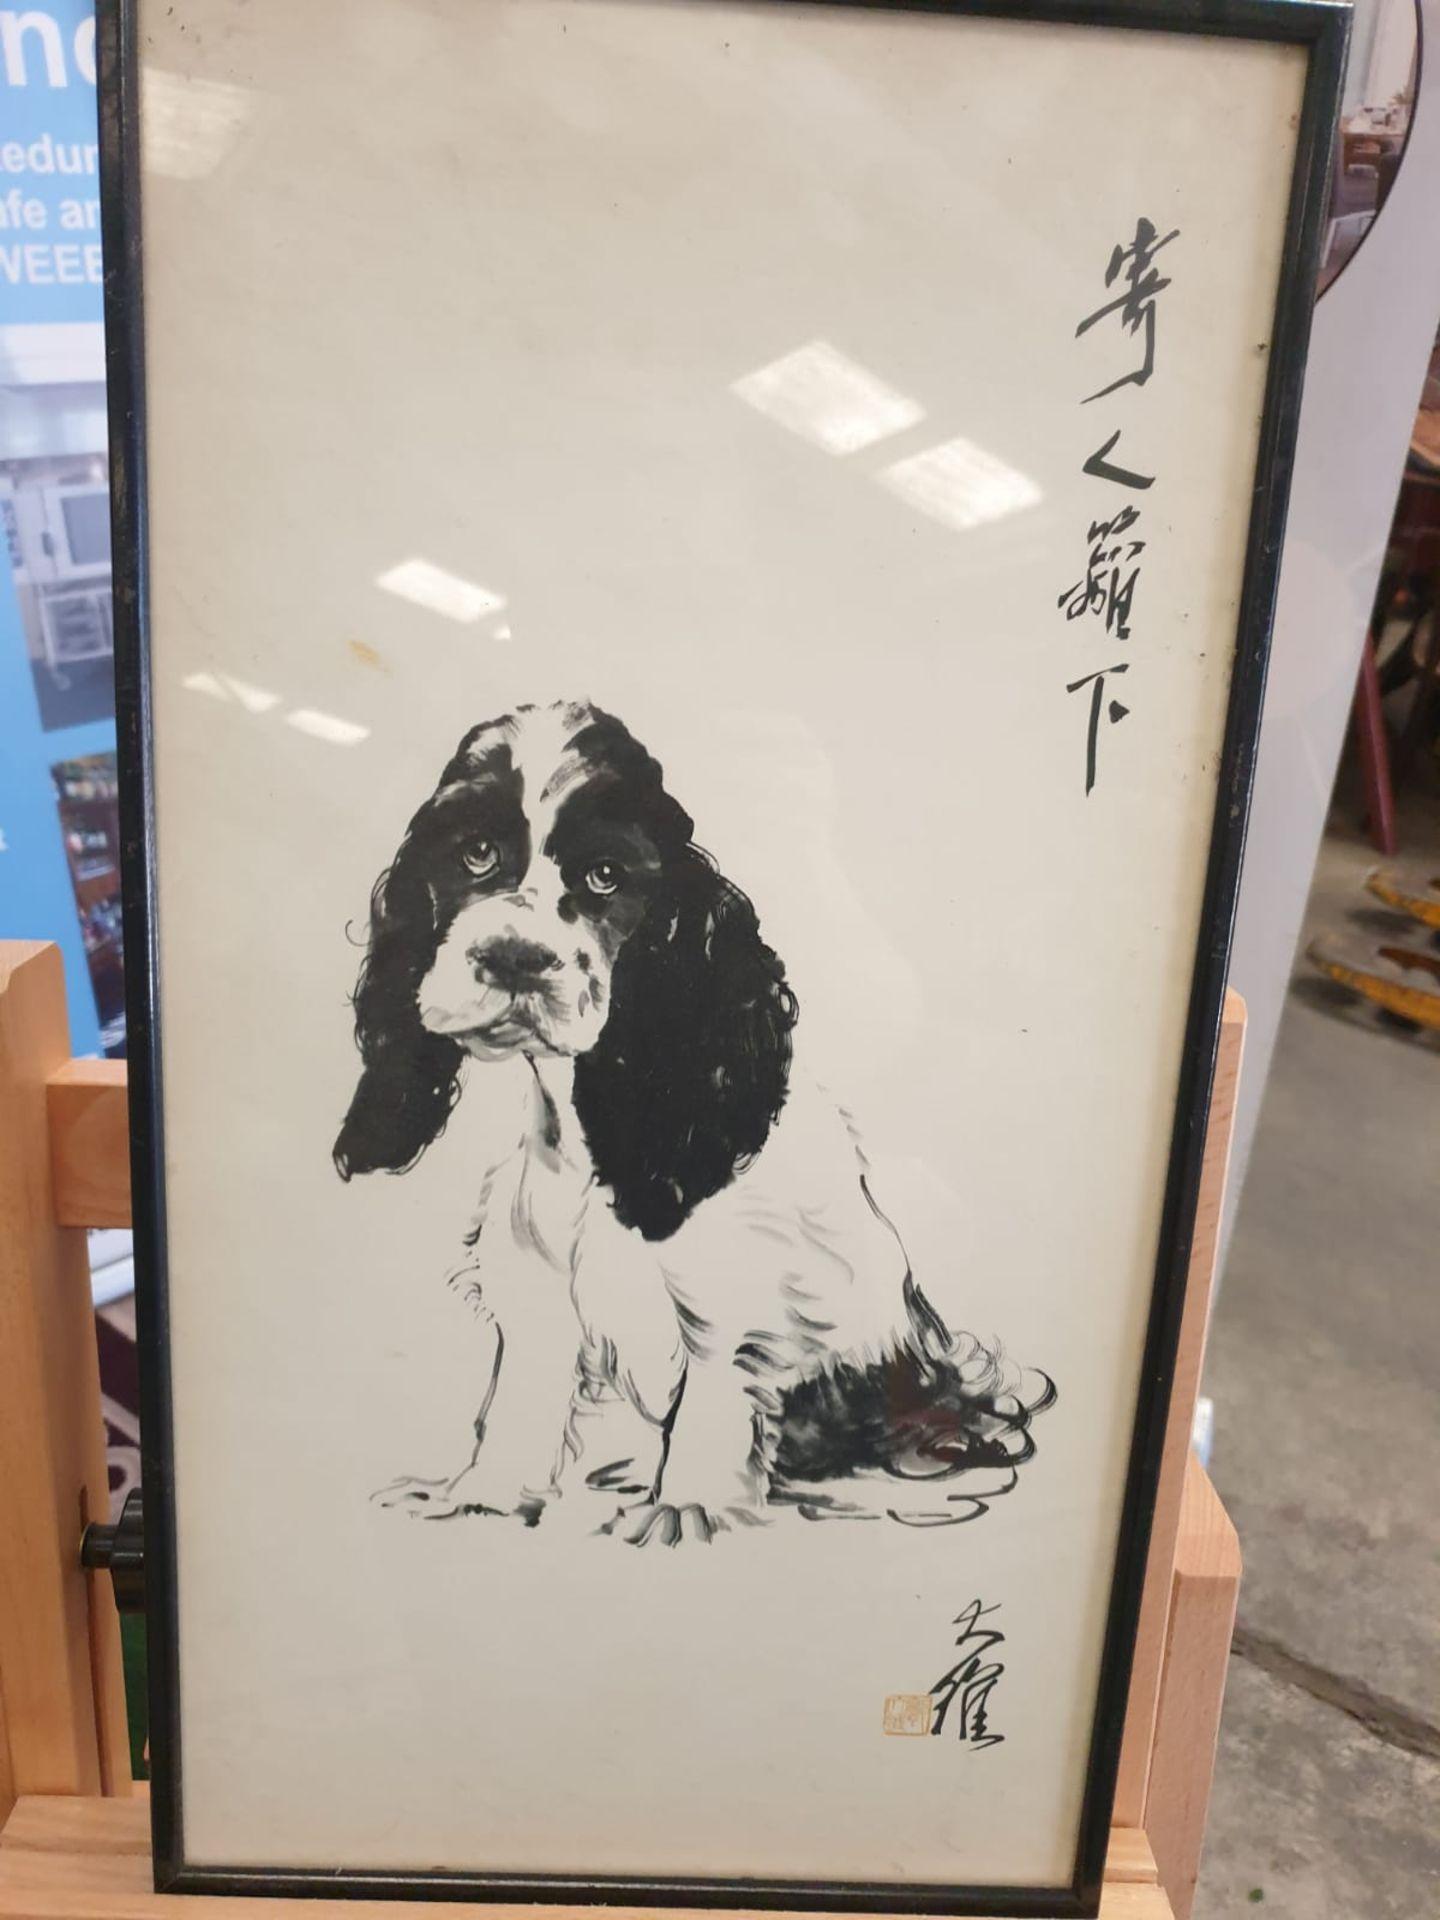 David Kwo Da-Wei (1919-2003) Chinese Lithographic Print Spaniel Da Wei Kwo, David Kwo 1919-2003 (